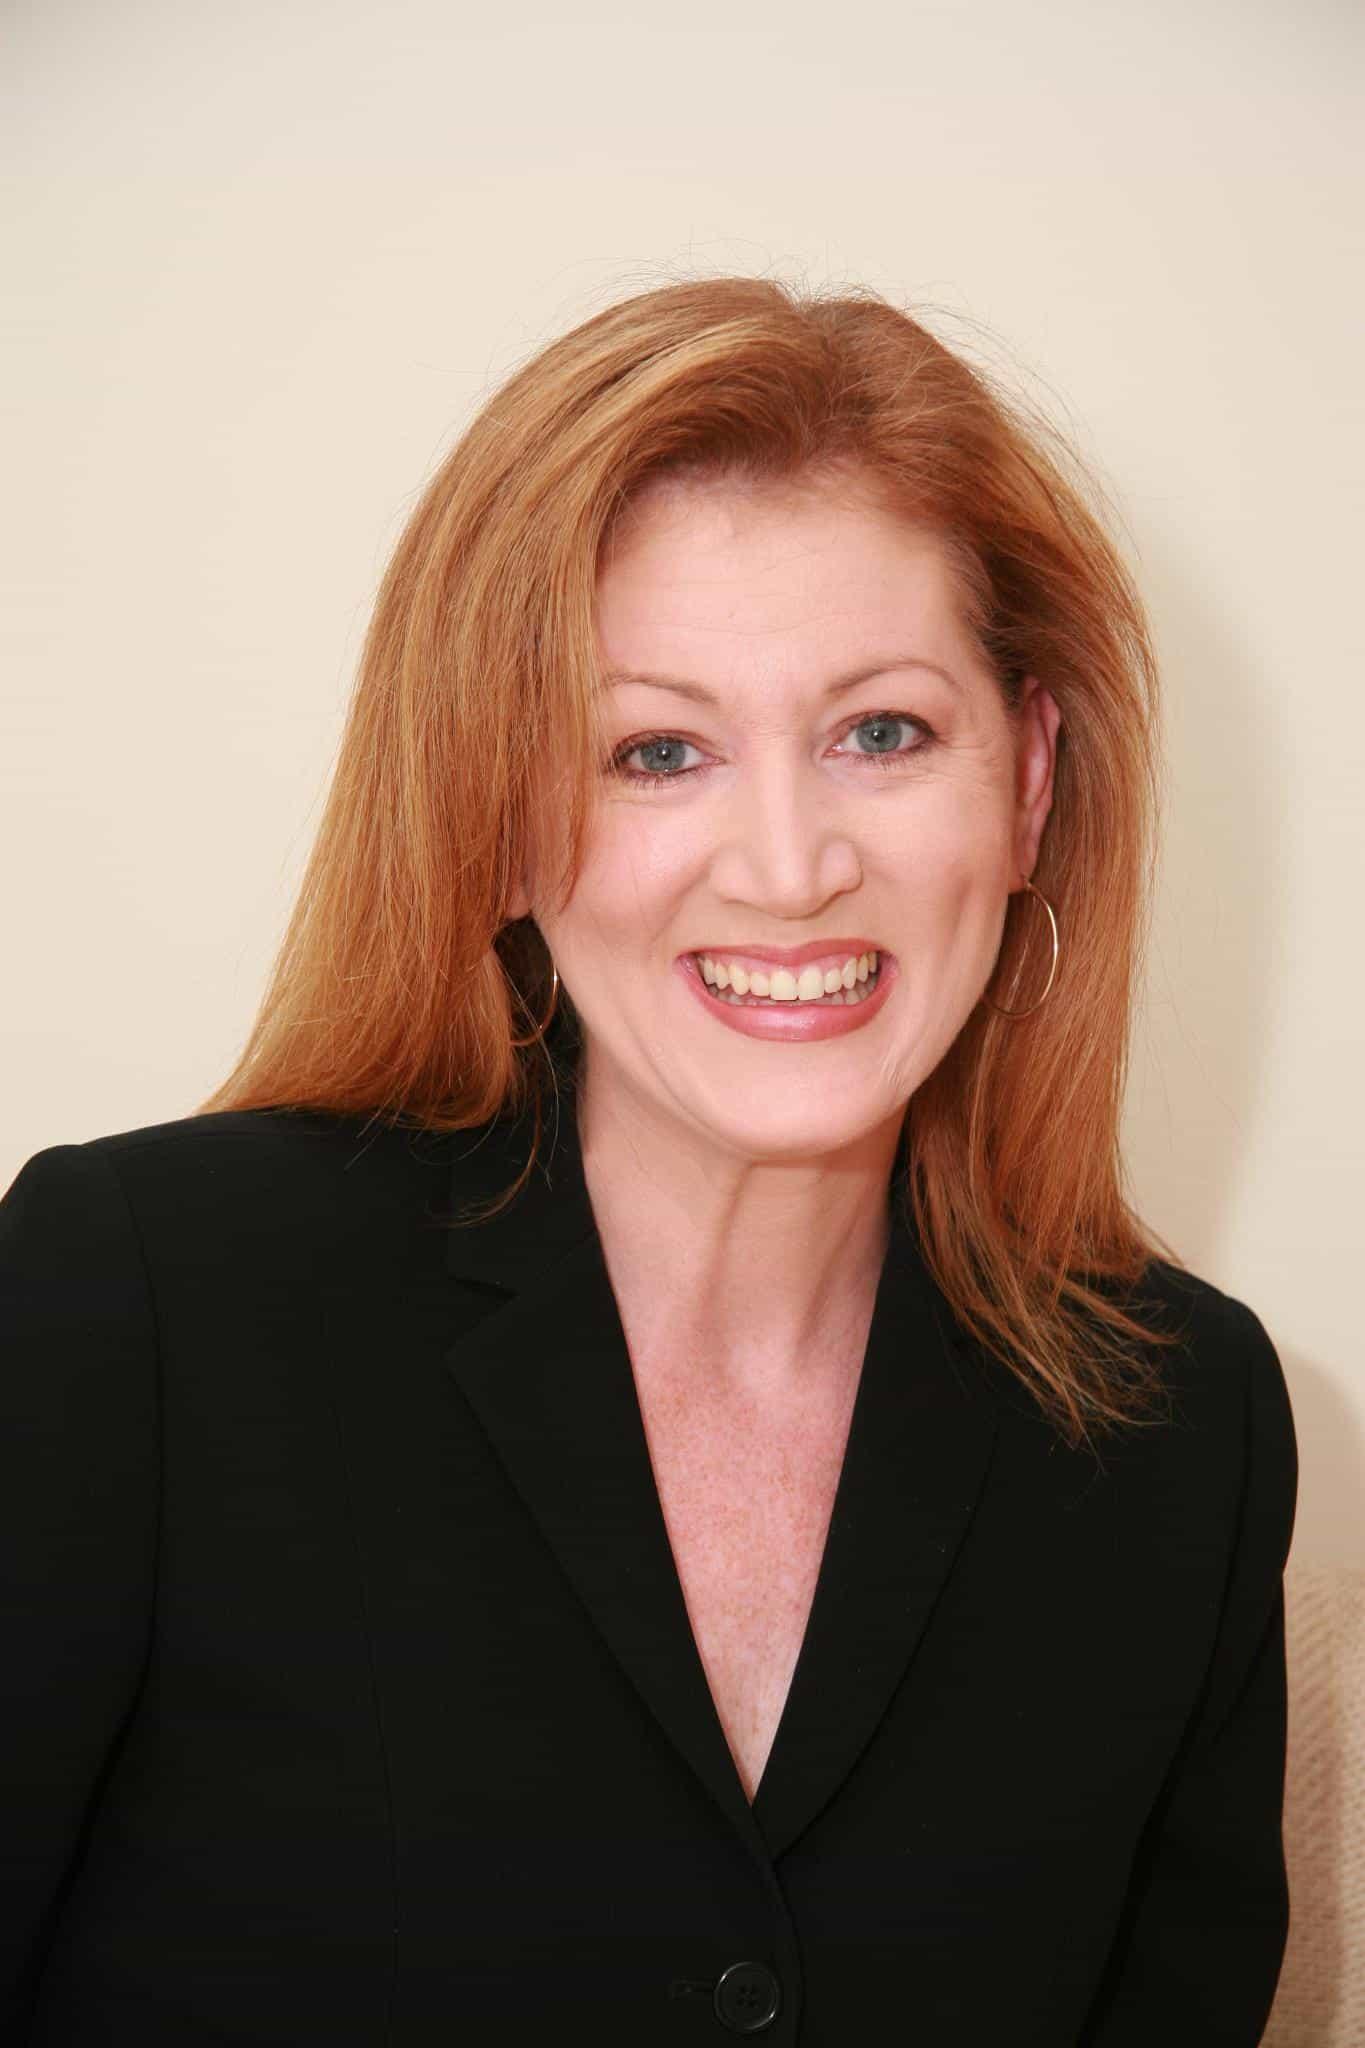 Joanne Gubbins Paladino